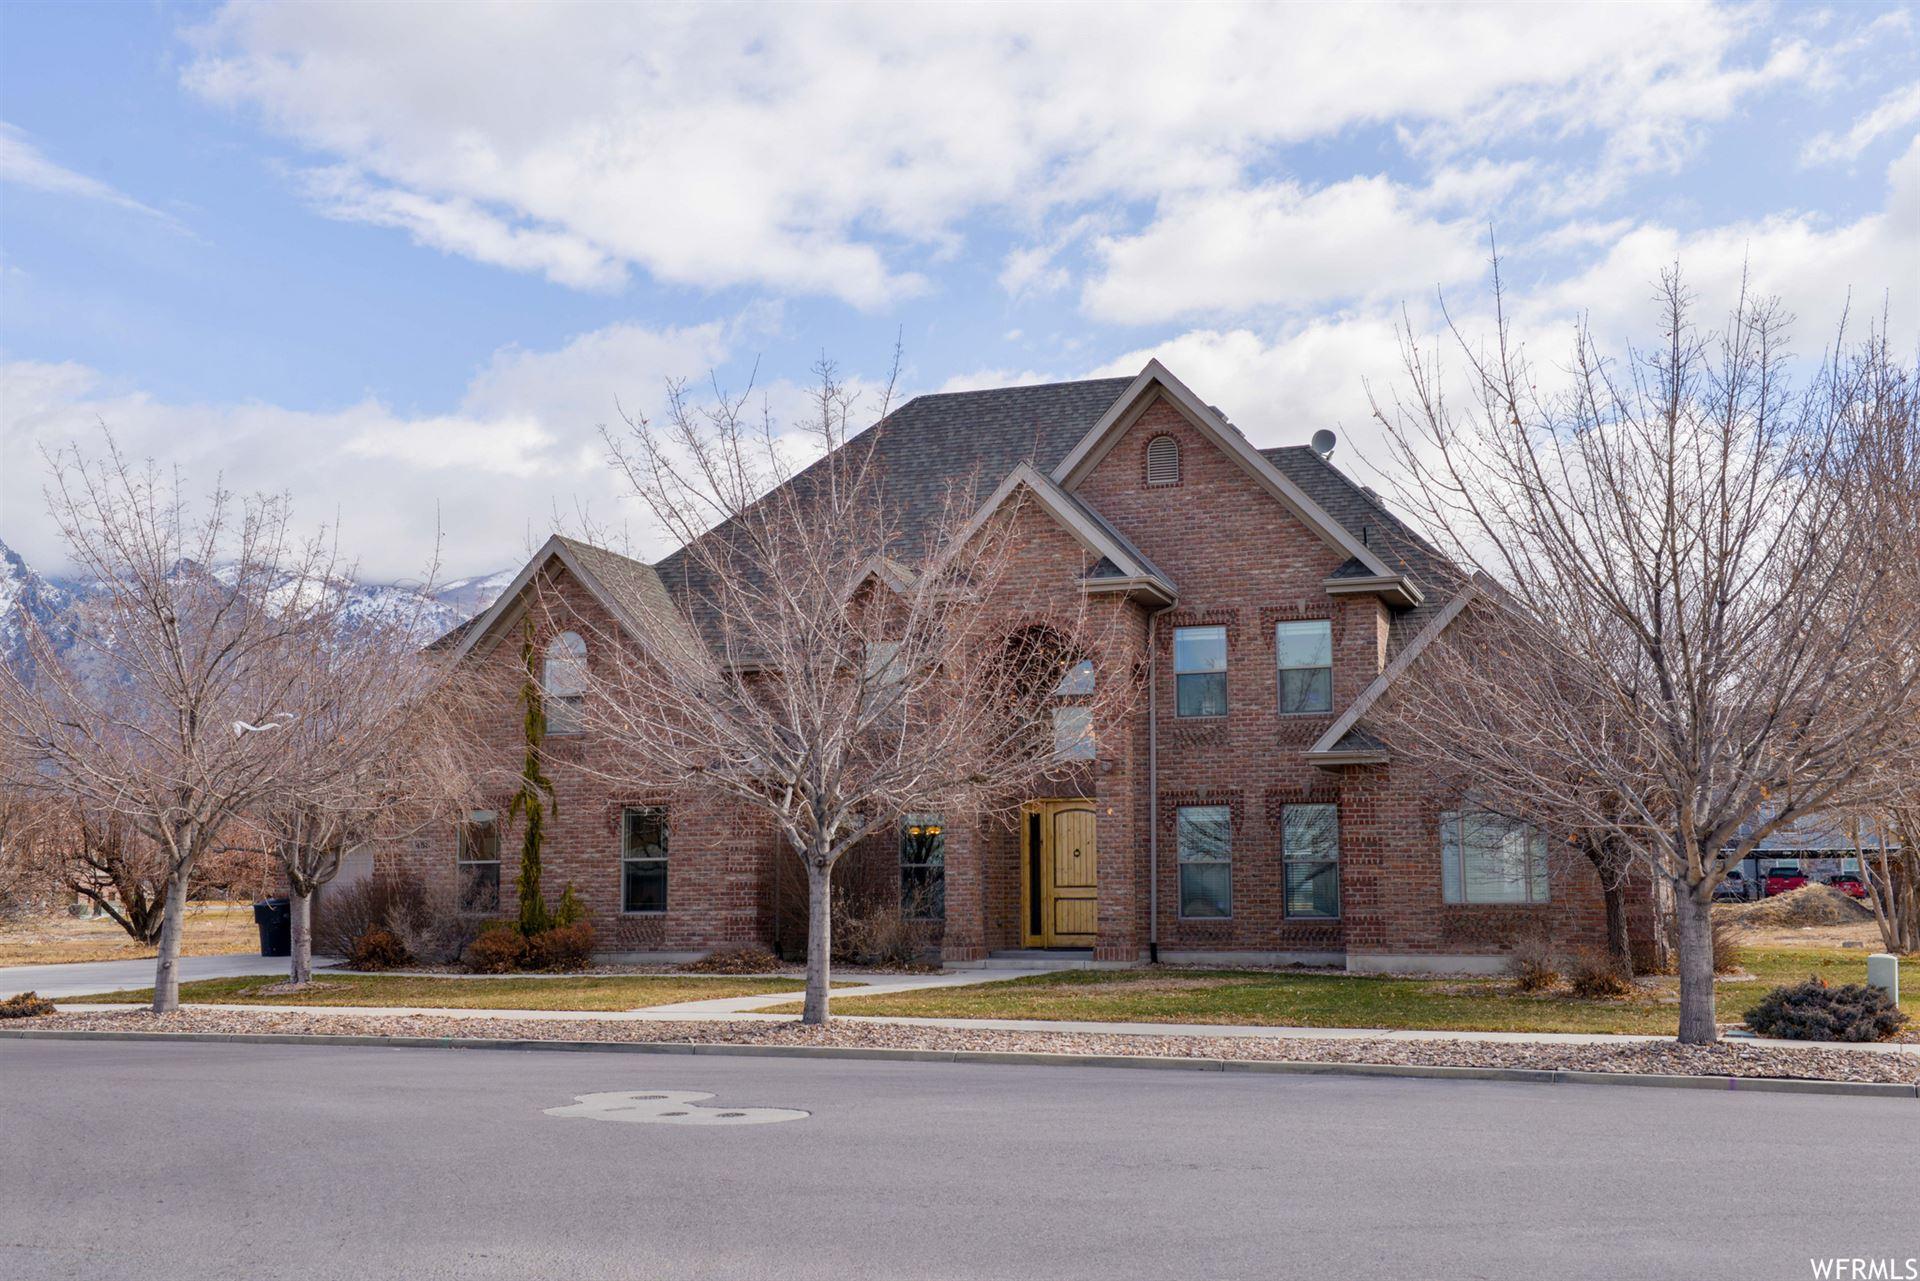 Photo of 453 S 750 W, Springville, UT 84663 (MLS # 1726753)